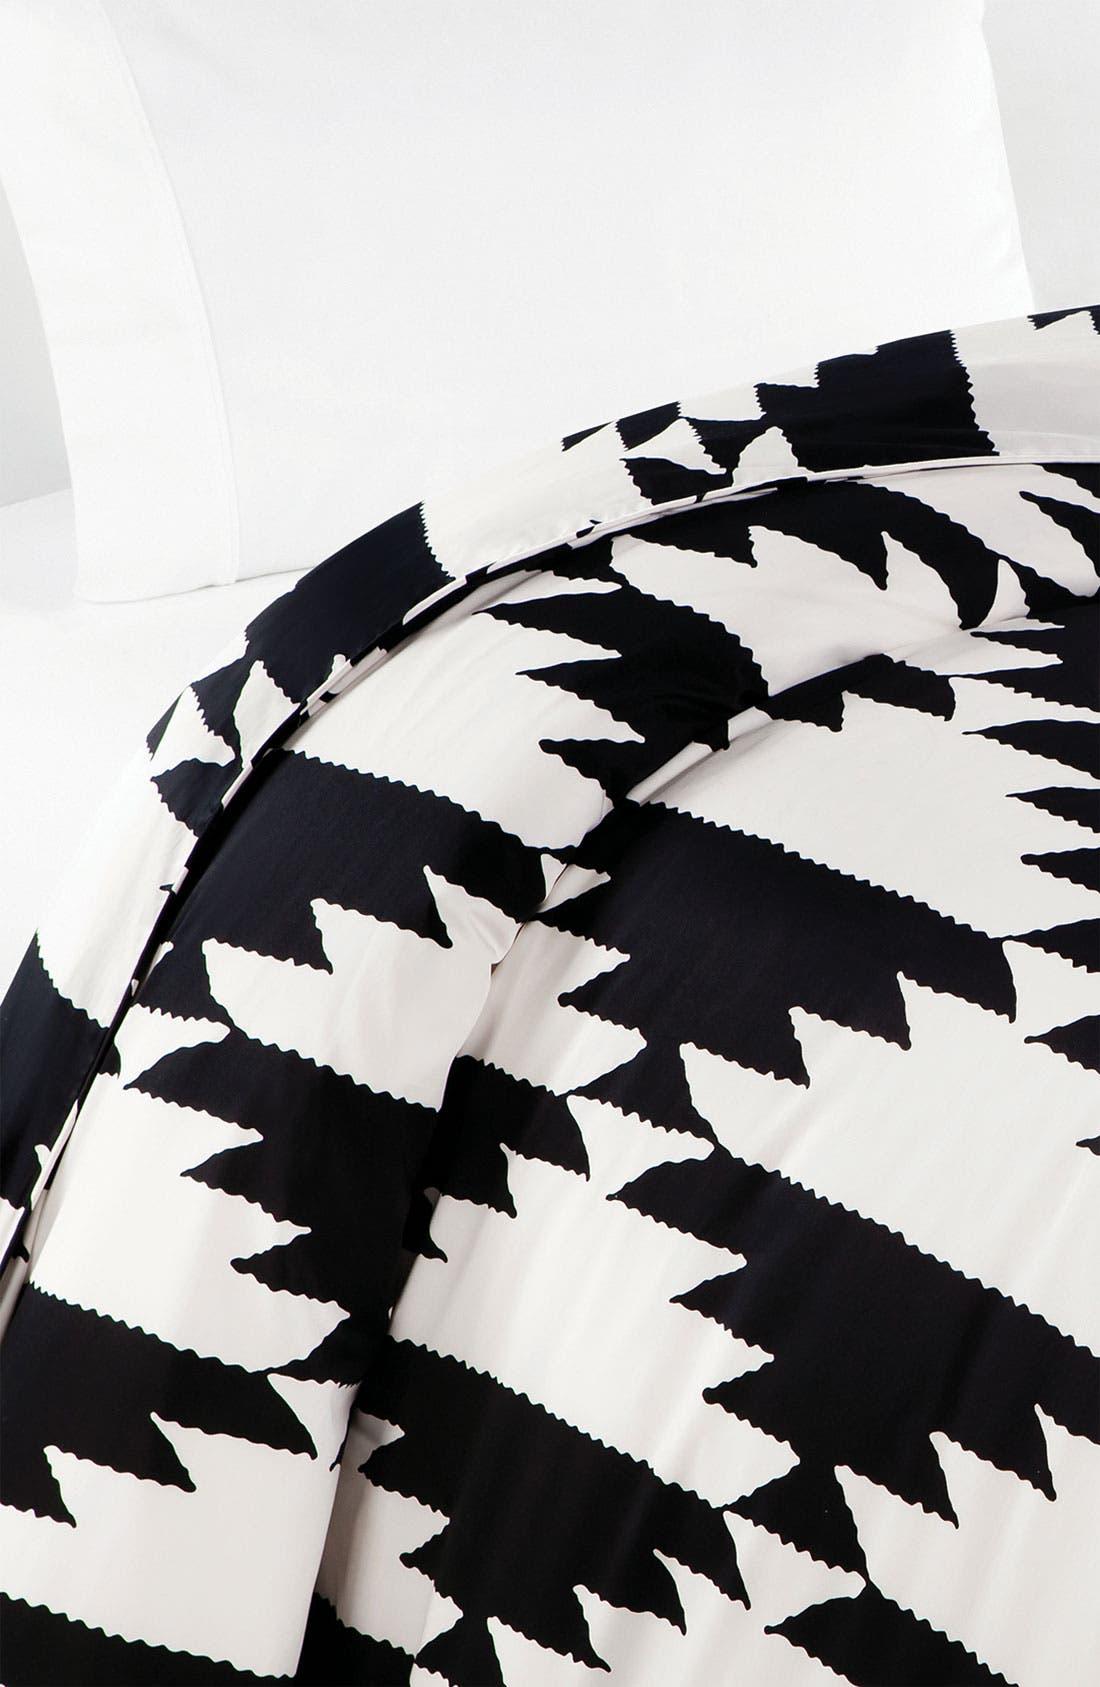 Alternate Image 1 Selected - Diane von Furstenberg 'Native Hound' 300 Thread Count Duvet Cover